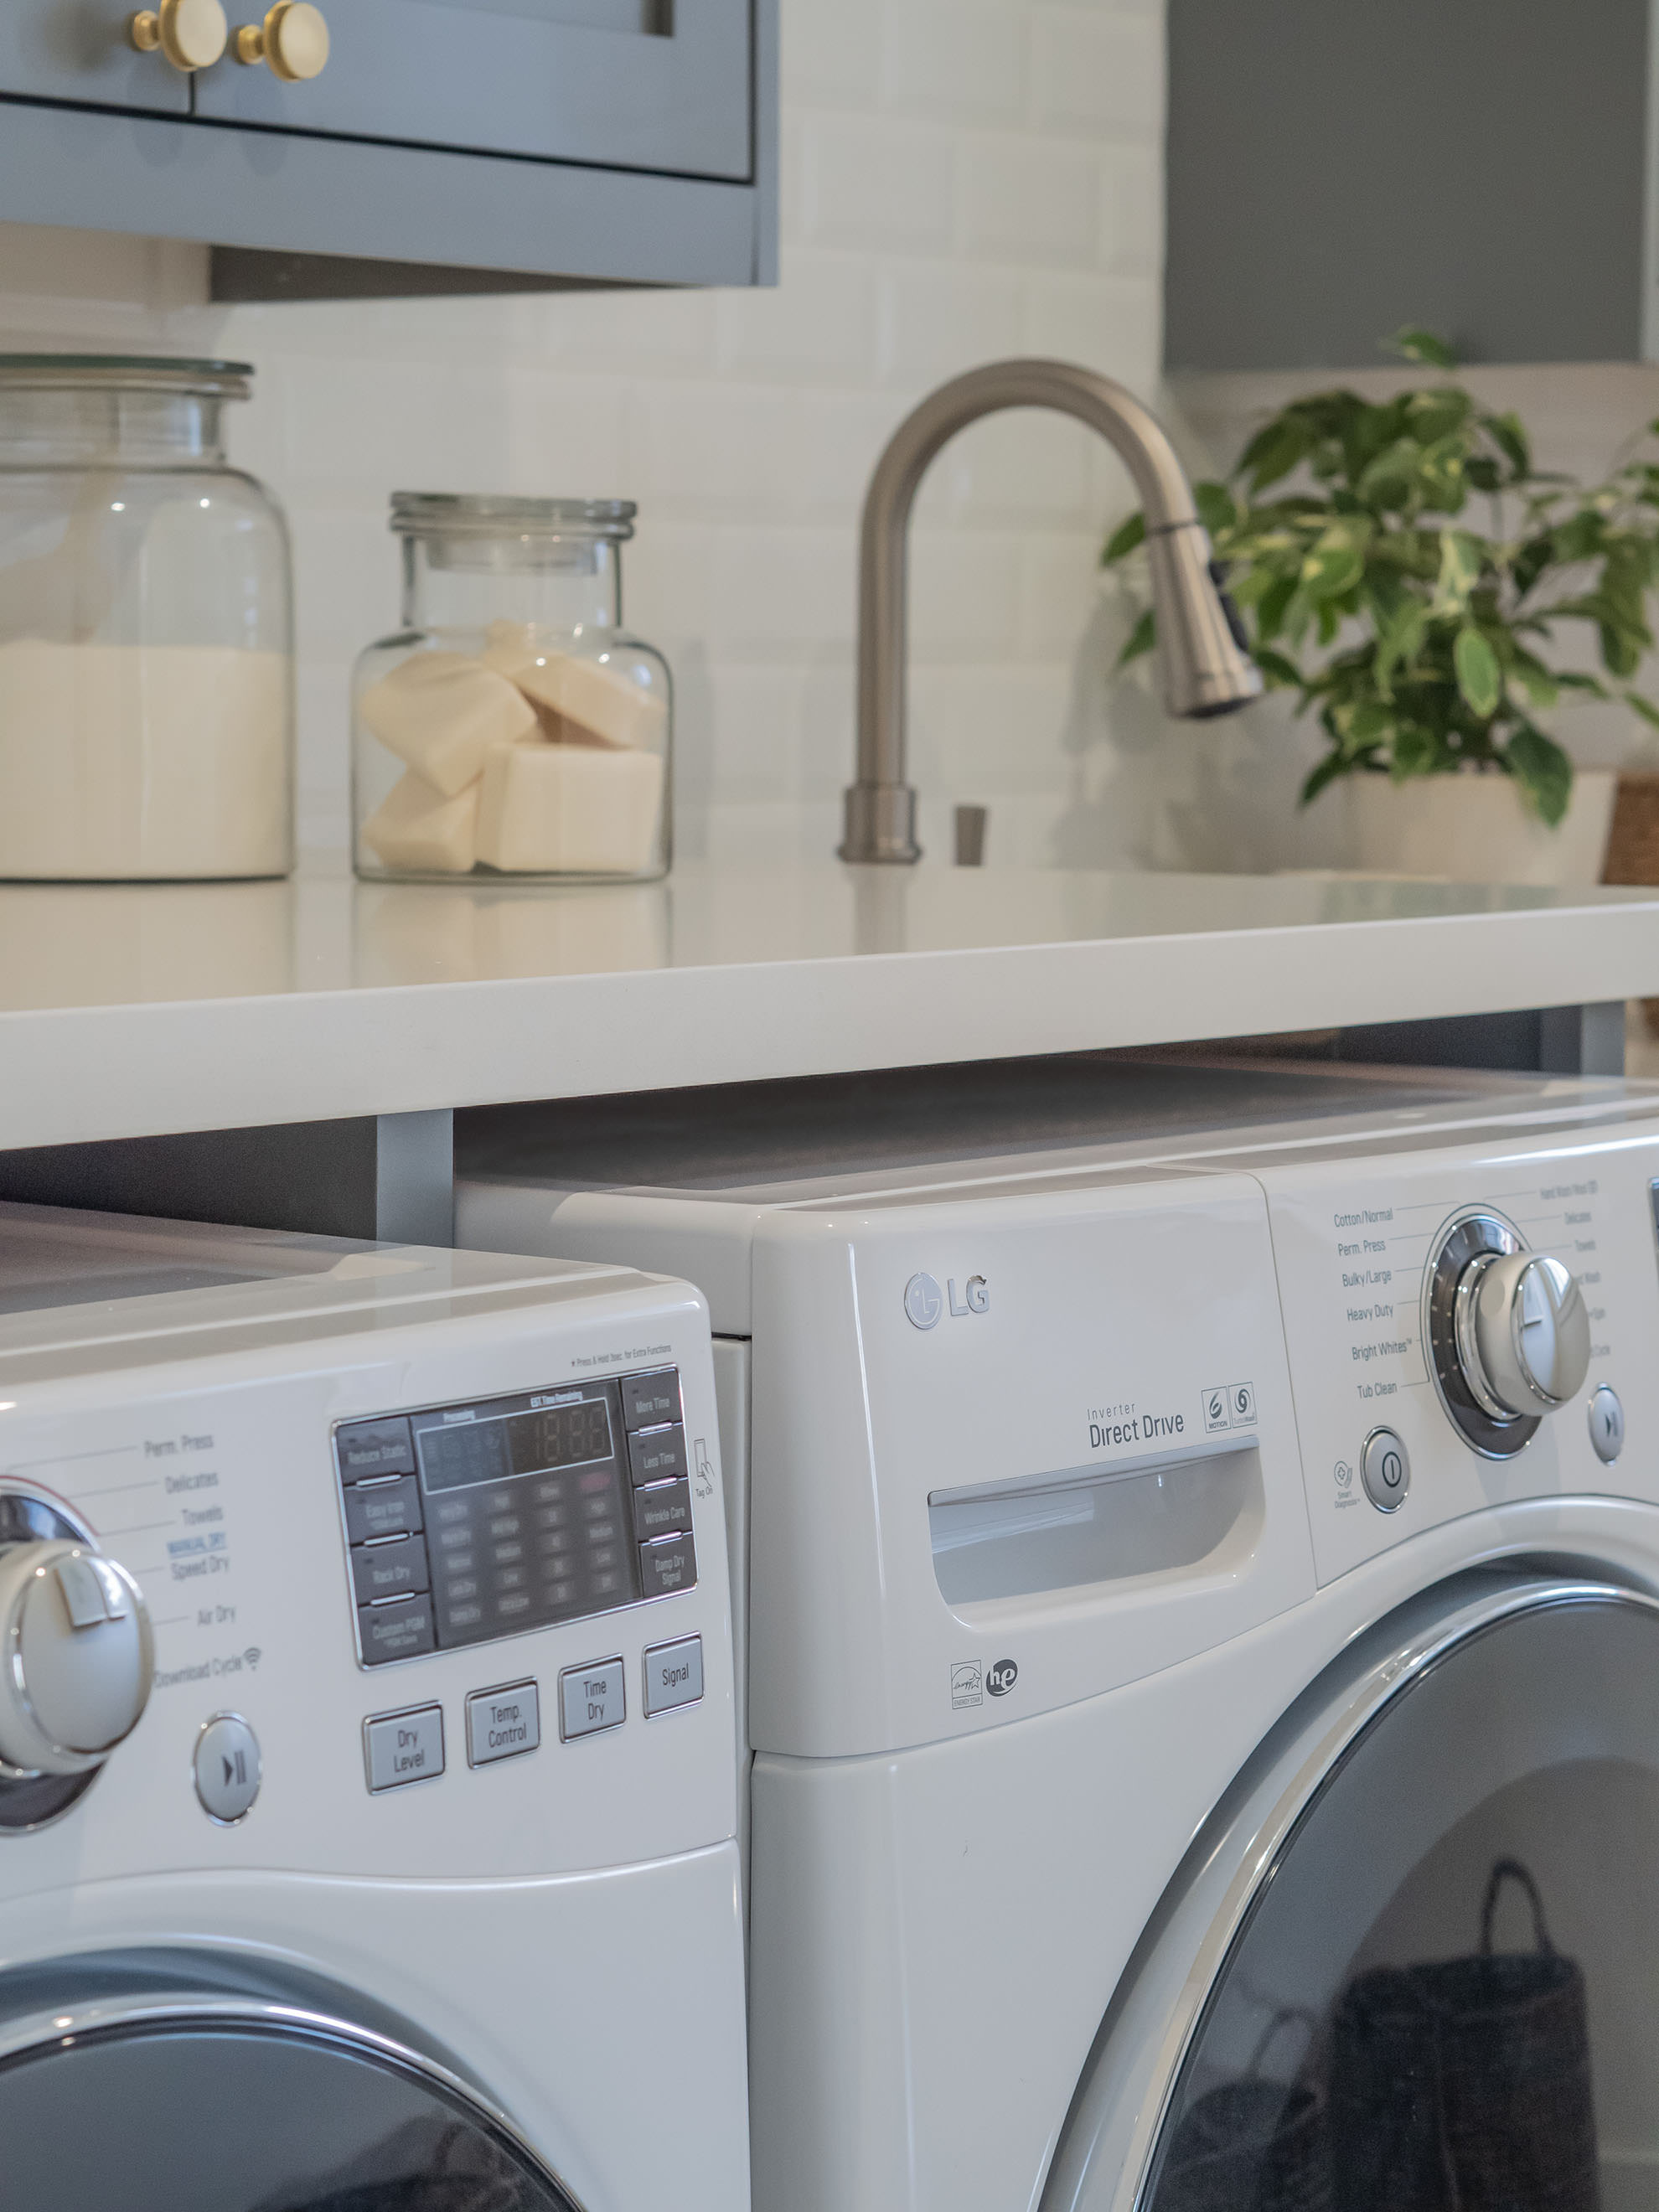 tnd-laundry-1010123.jpg